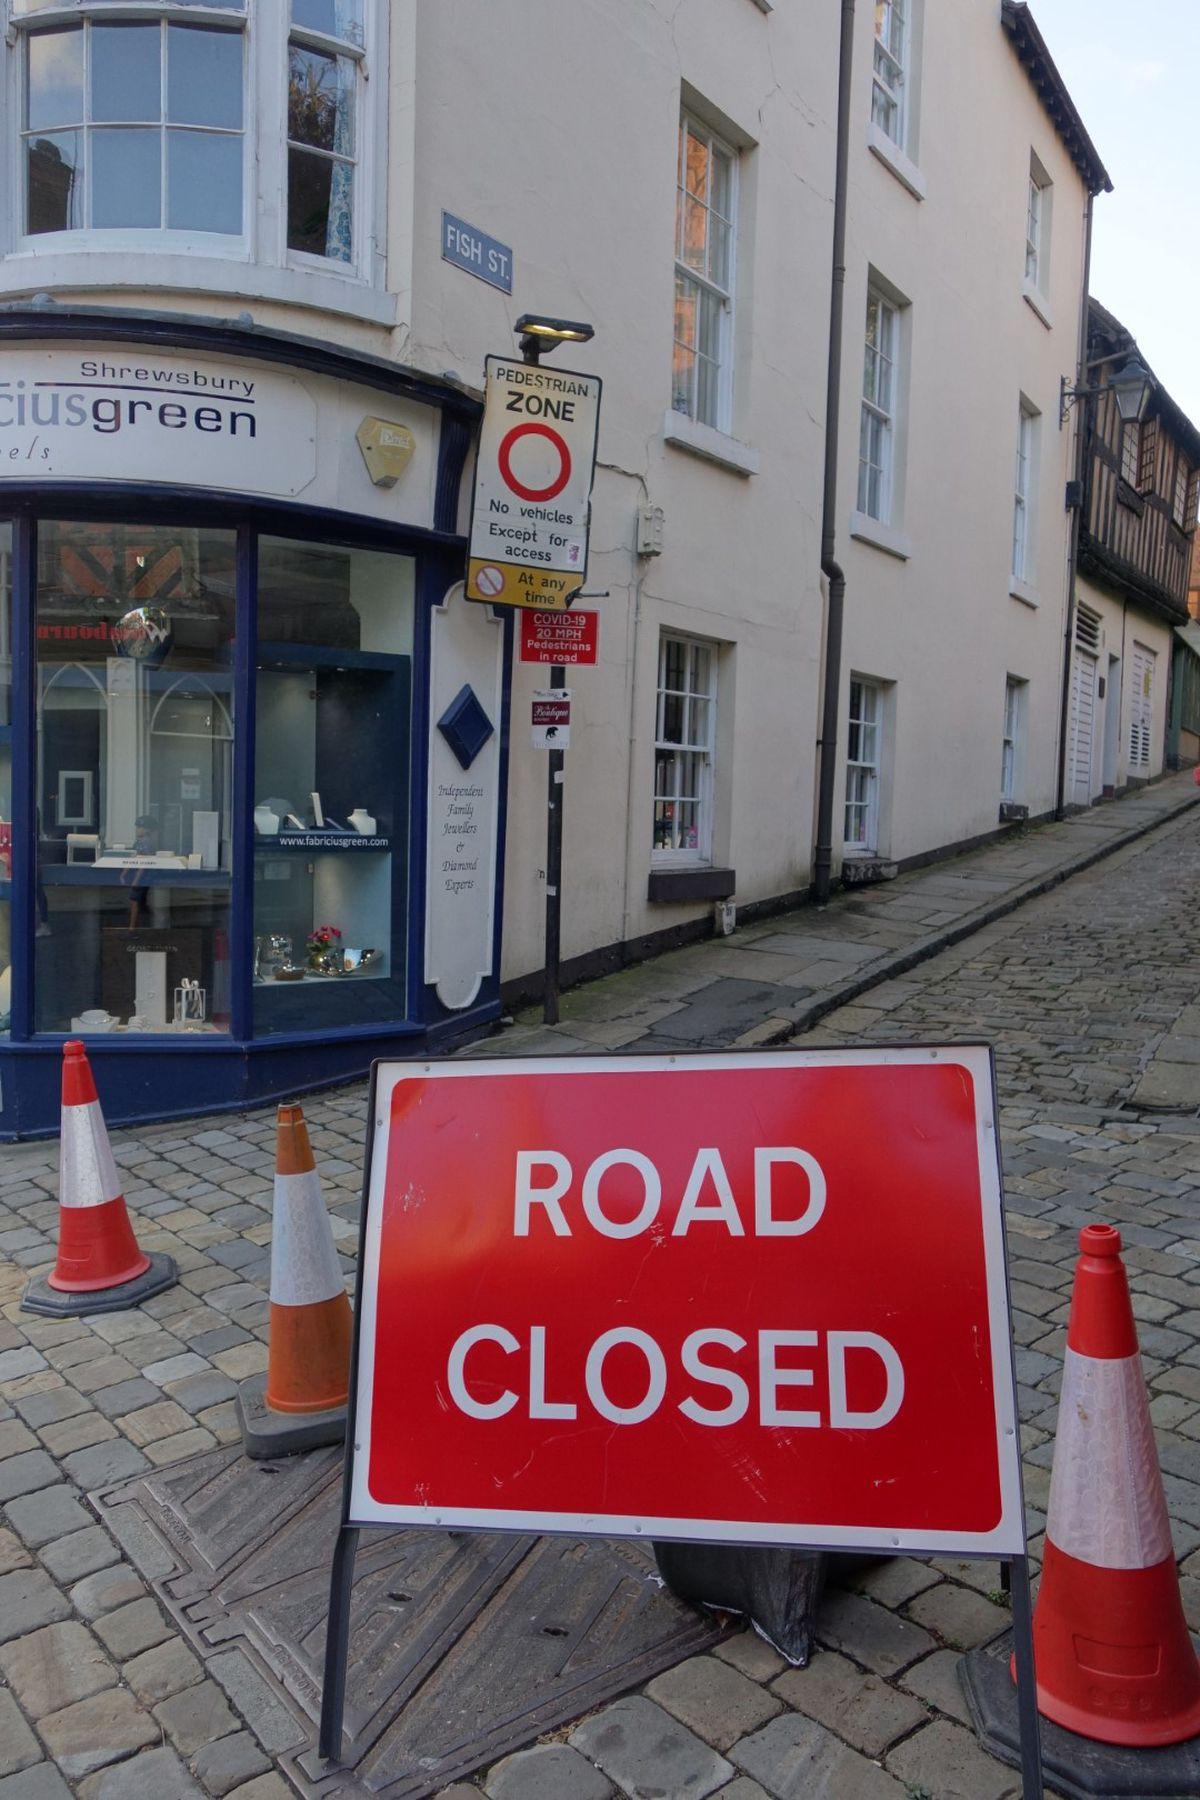 Road closed sign at the corner of Fish Street and High Street. Photo: W Tomaszewski